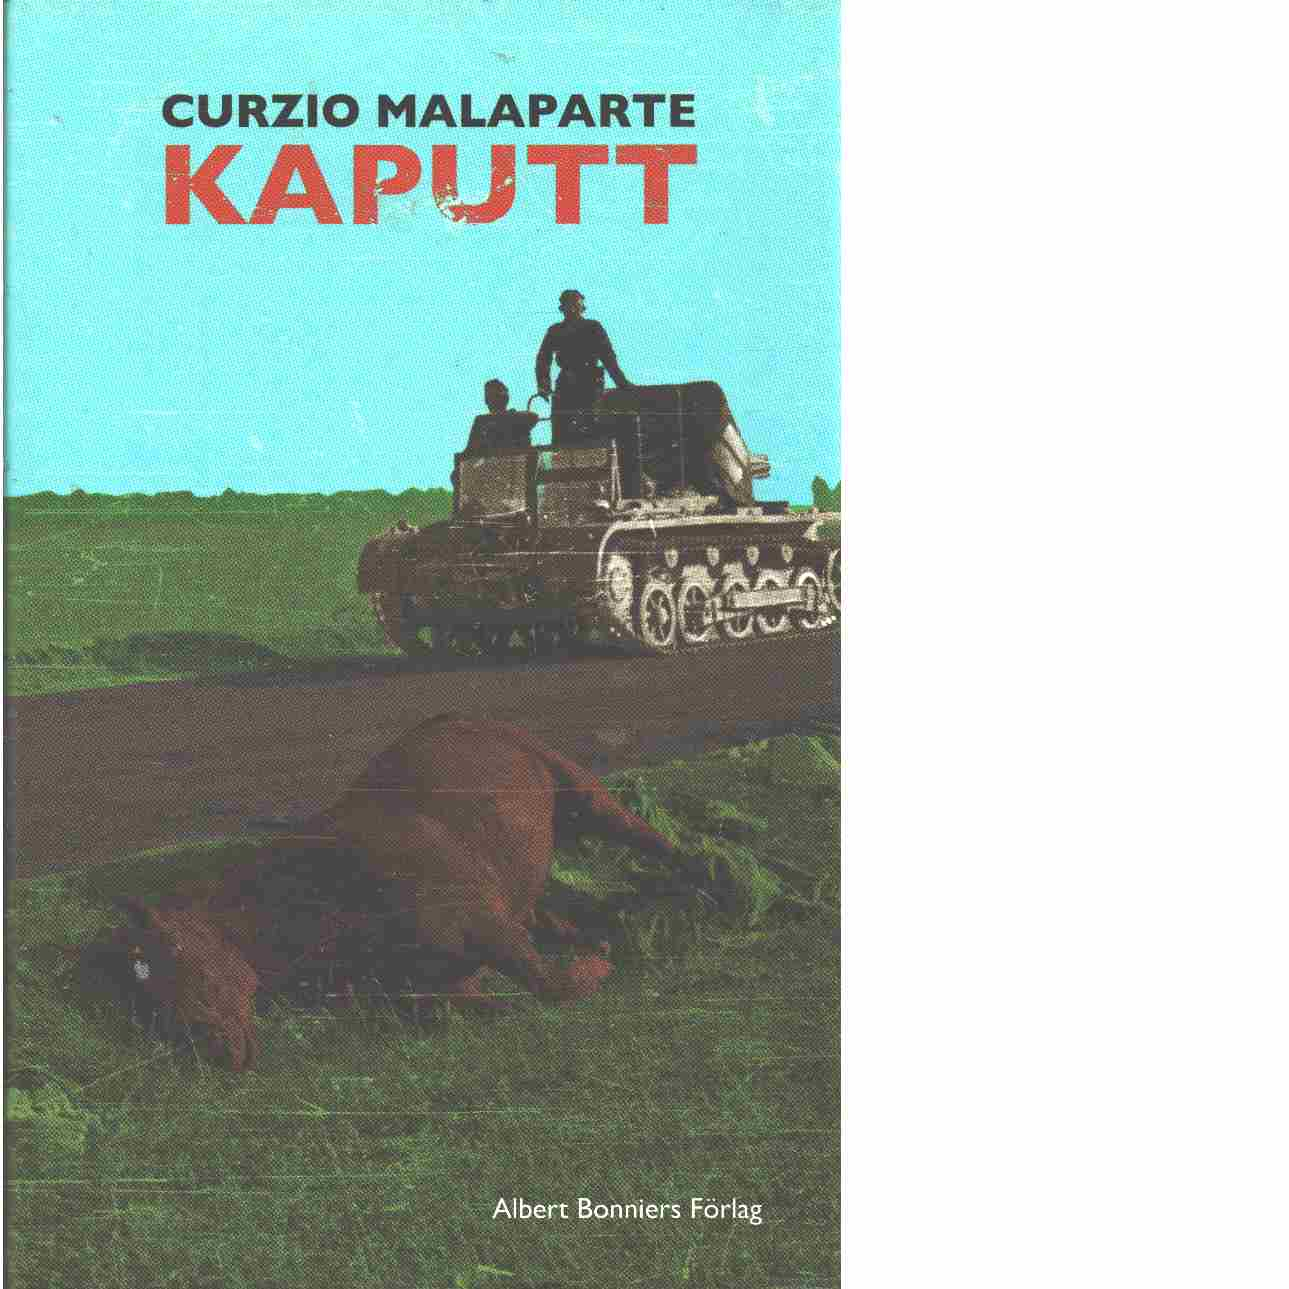 Kaputt - Malaparte, Curzio